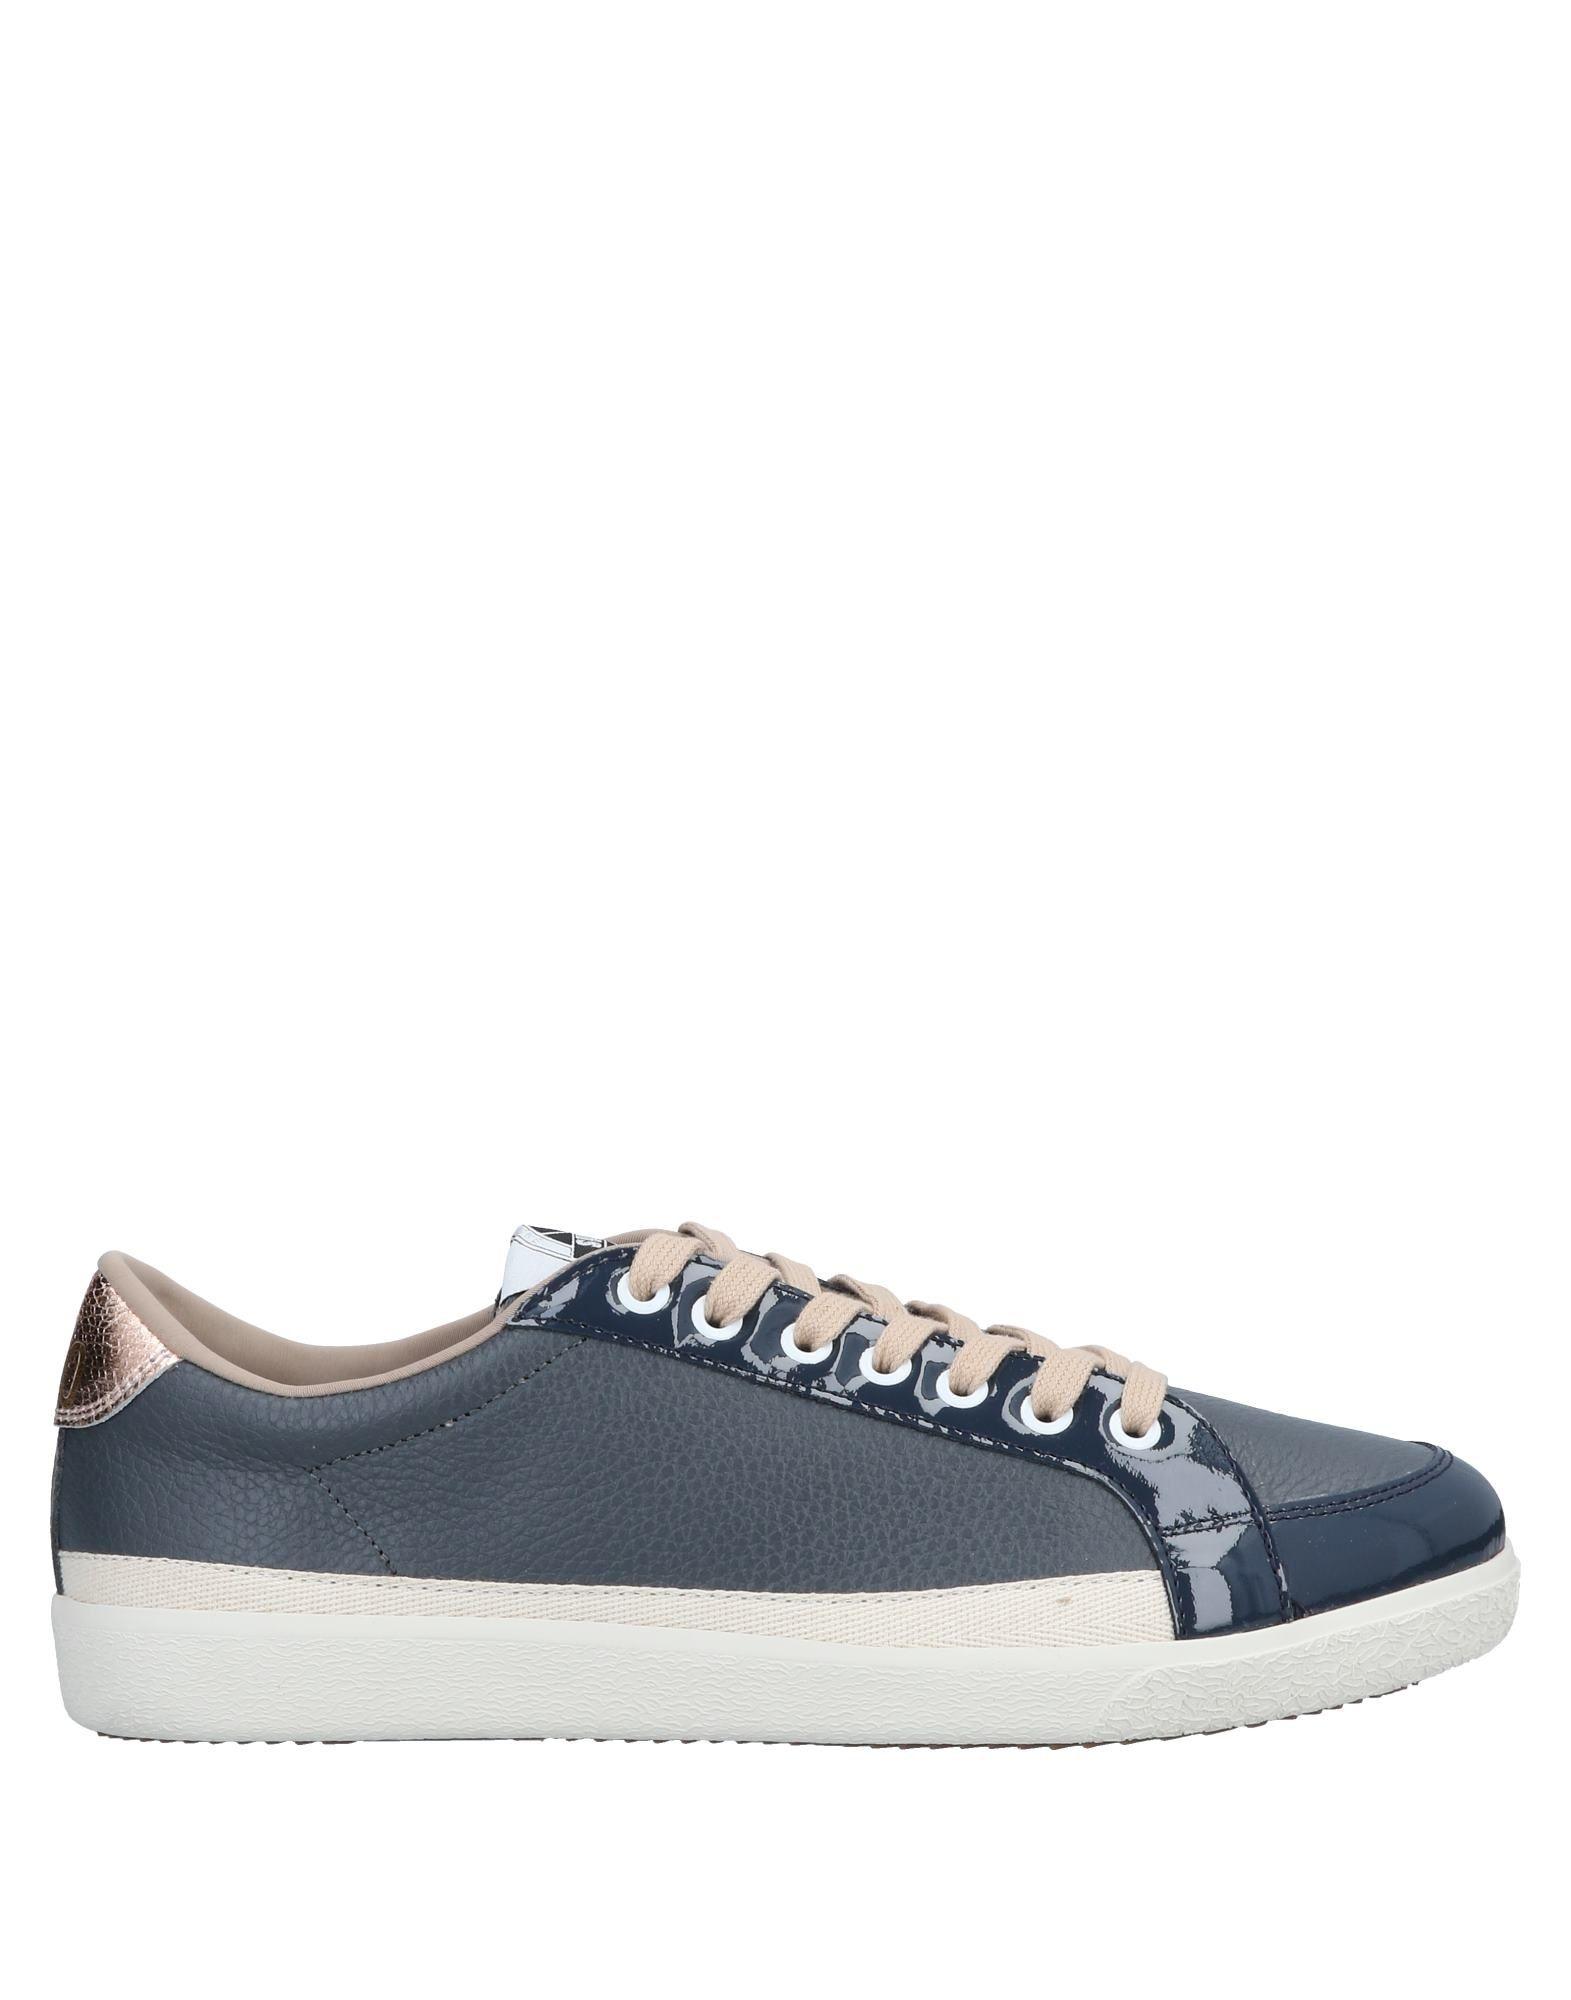 Zapatillas Pantofola D'oro Hombre - Zapatillas Pantofola D'oro D'oro Pantofola  Azul francés a82106